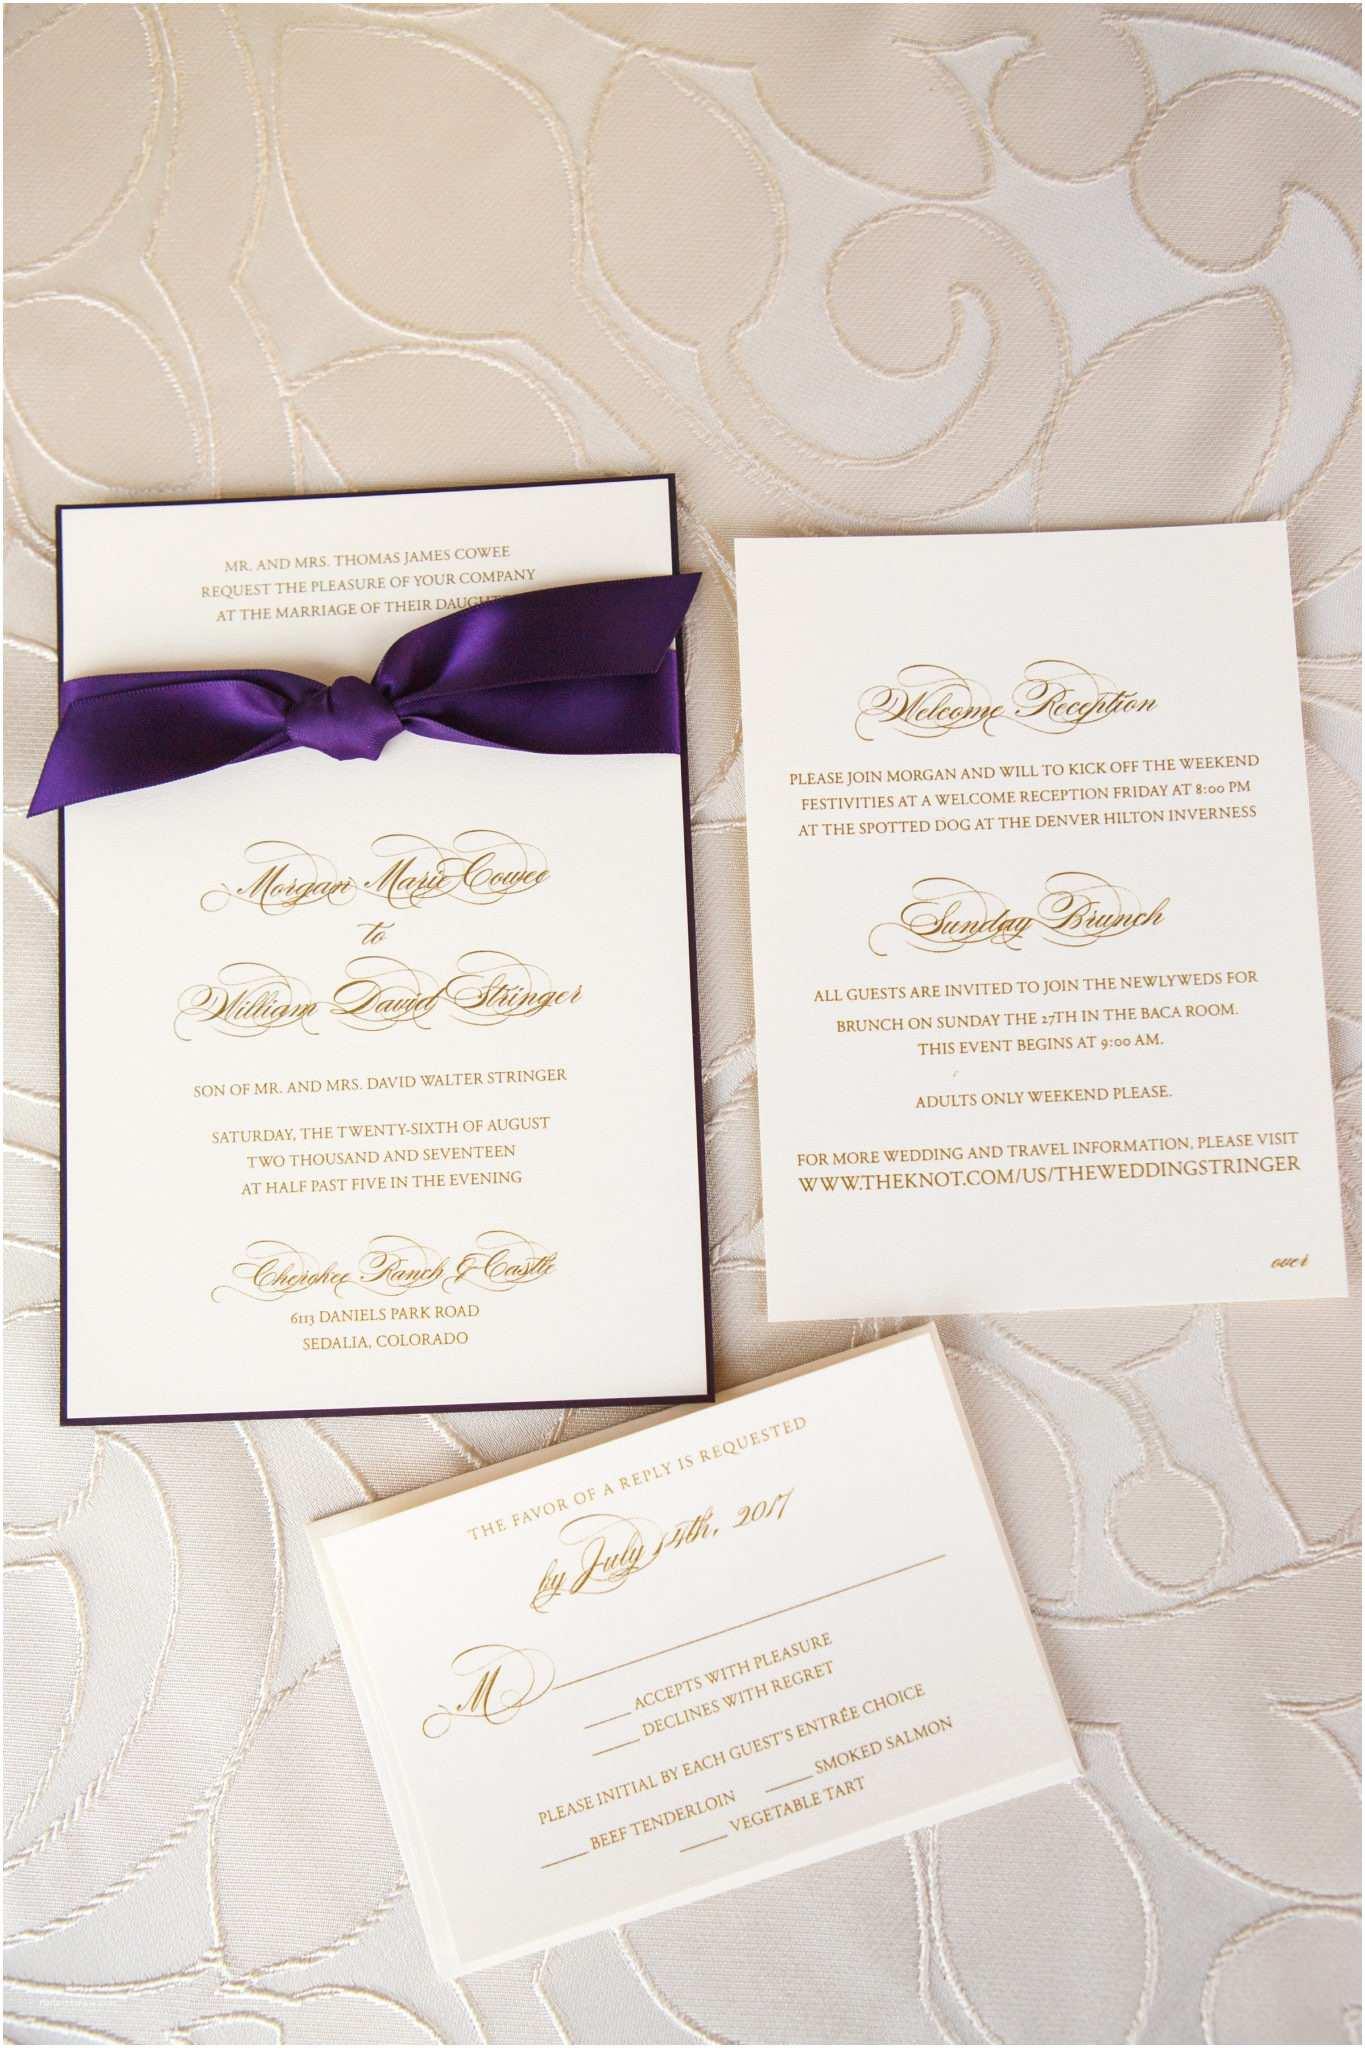 Wedding Invitations Denver Cloud 9 Wedding Planners Denver